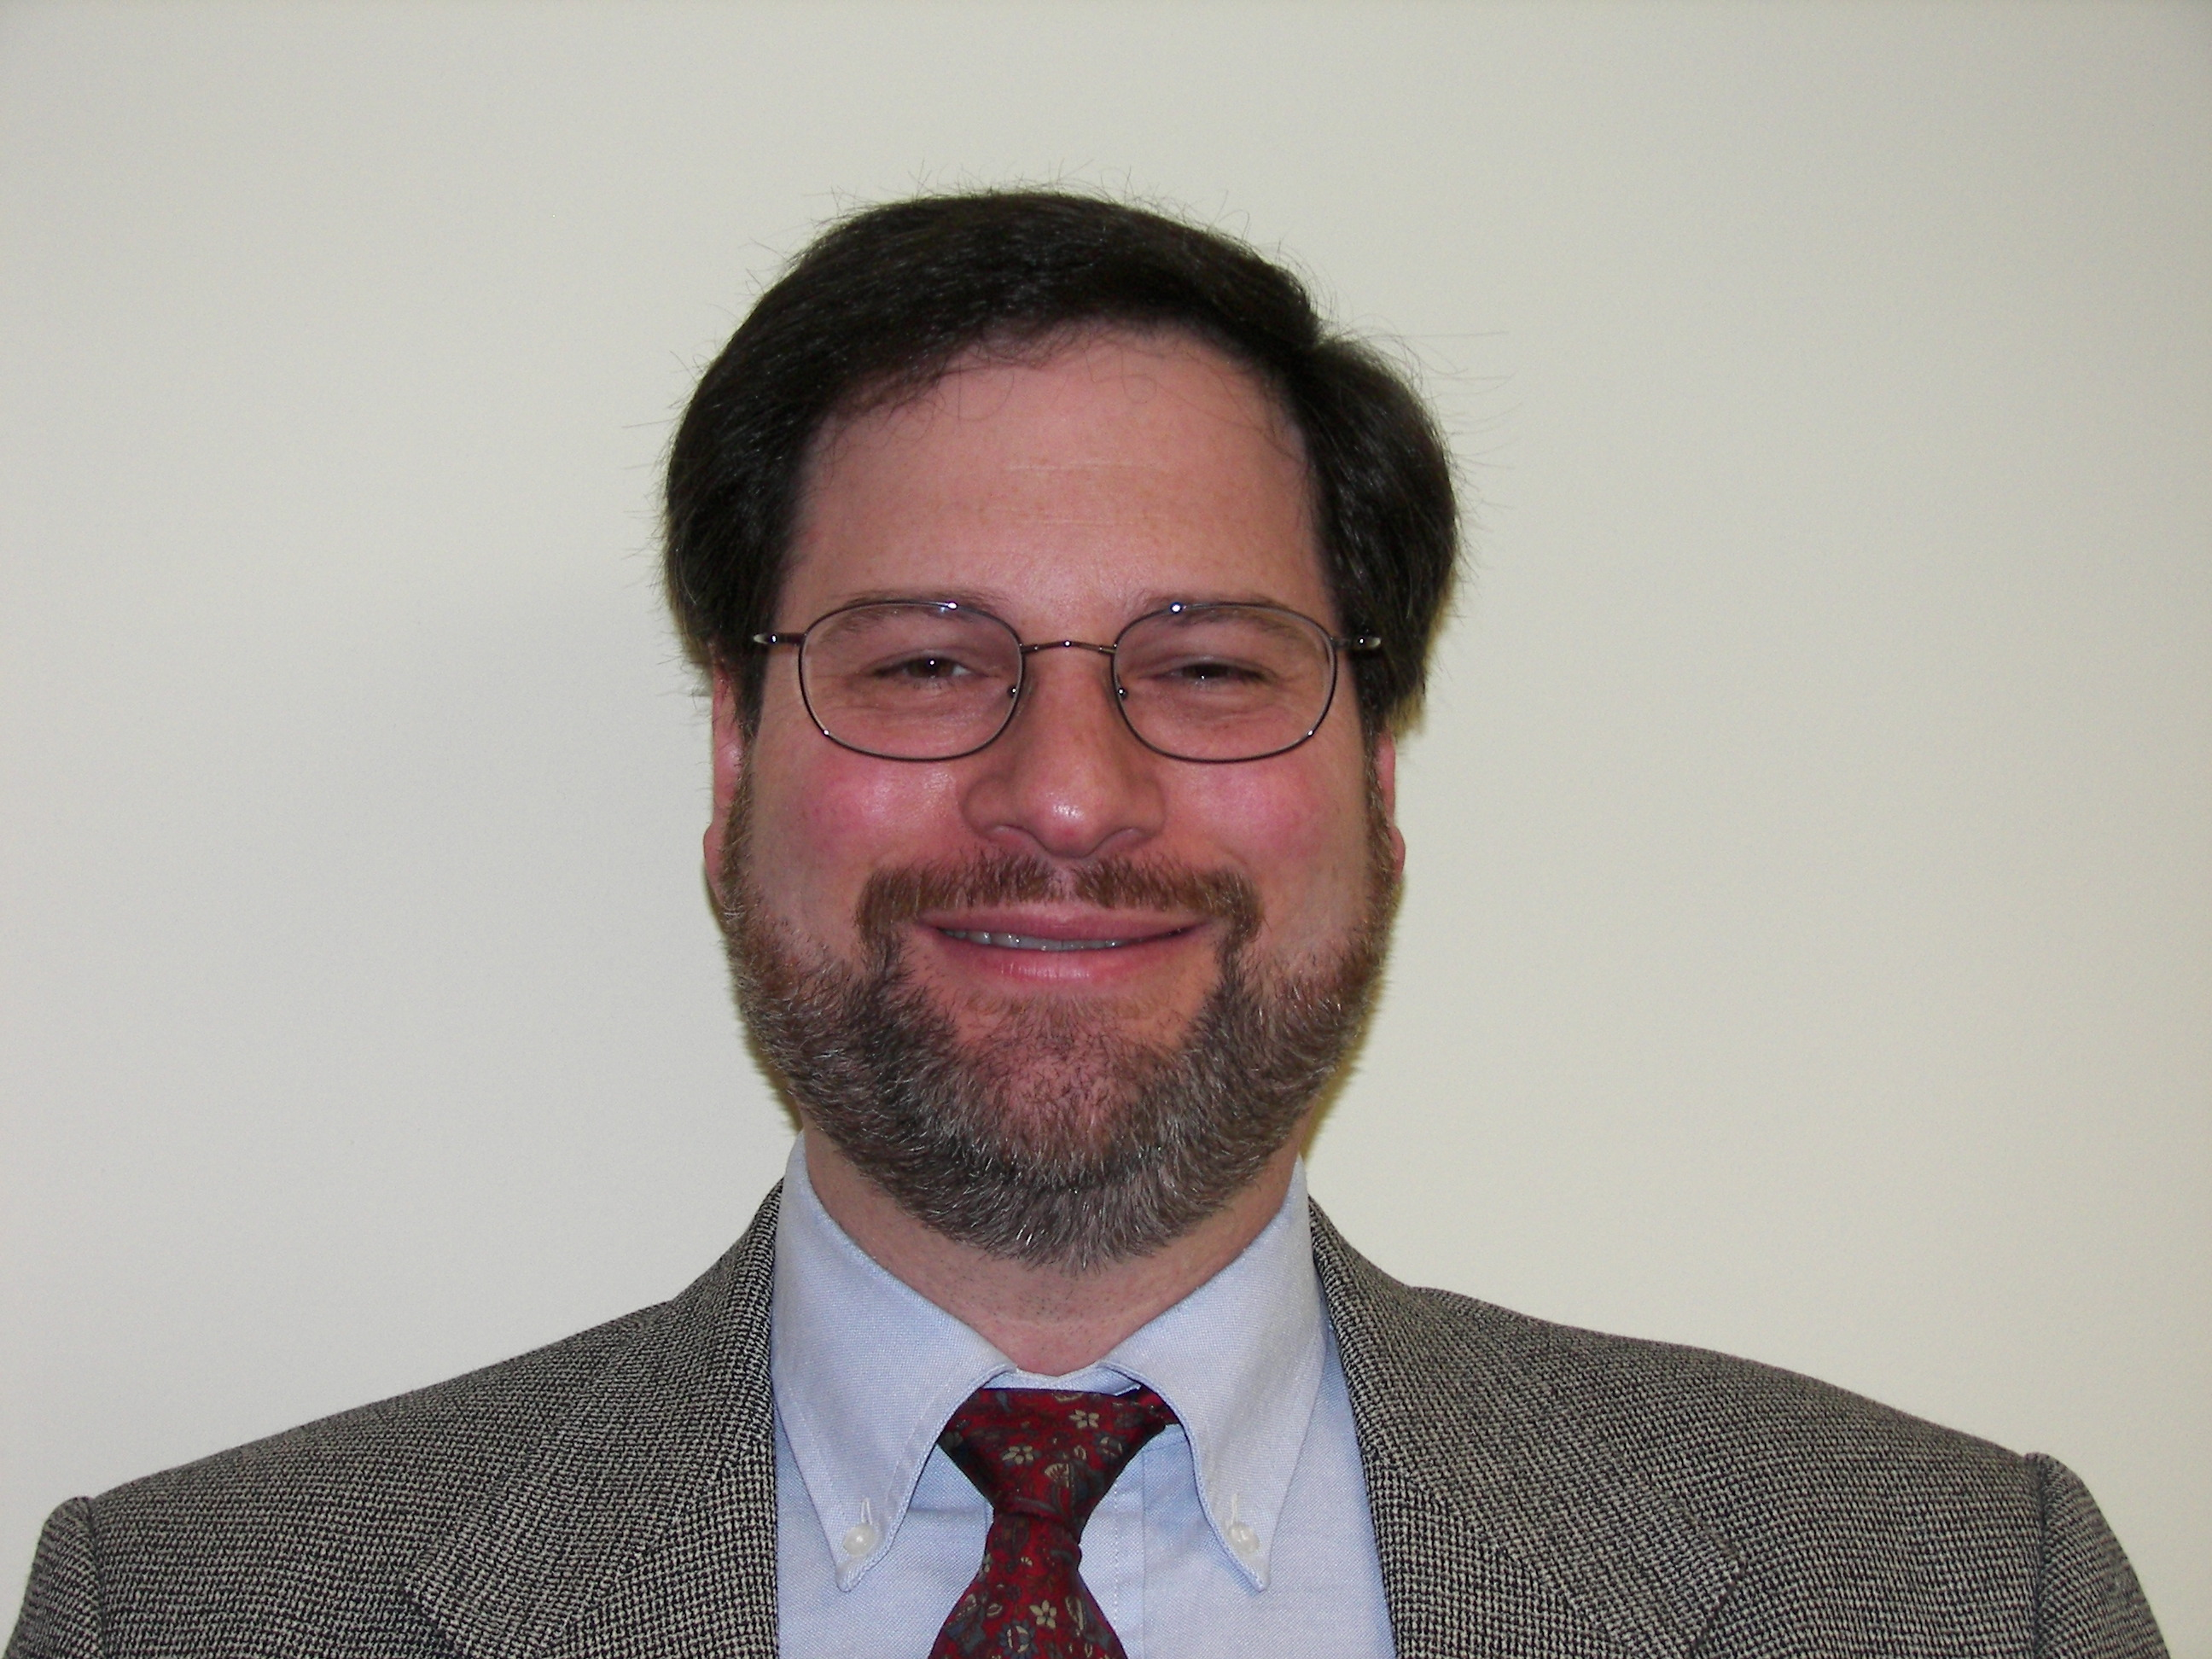 Adam J. Frank, MD